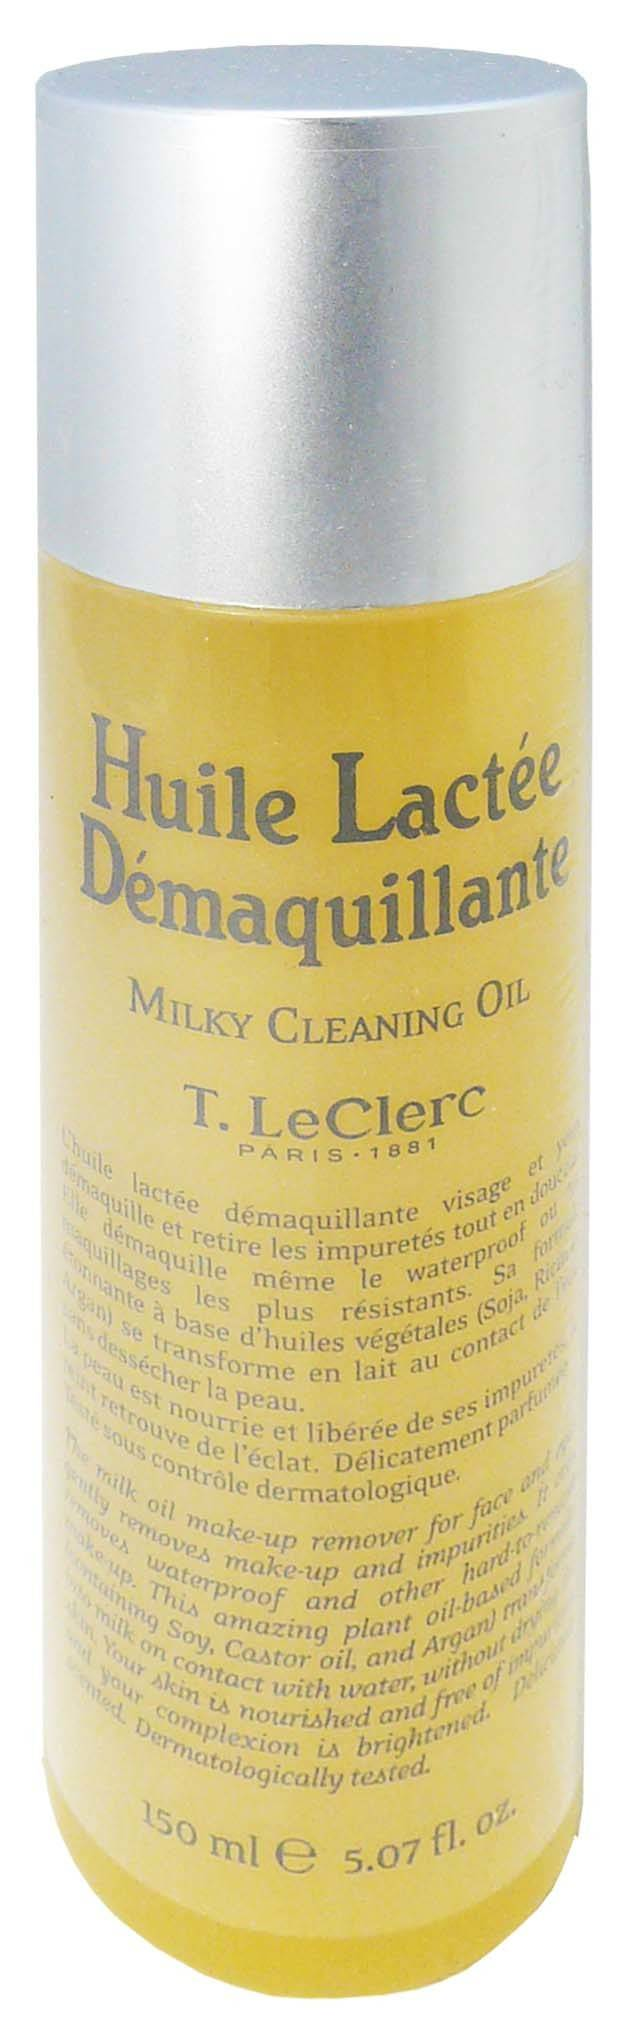 T.leclerc huile lactee demaquillante 150ml